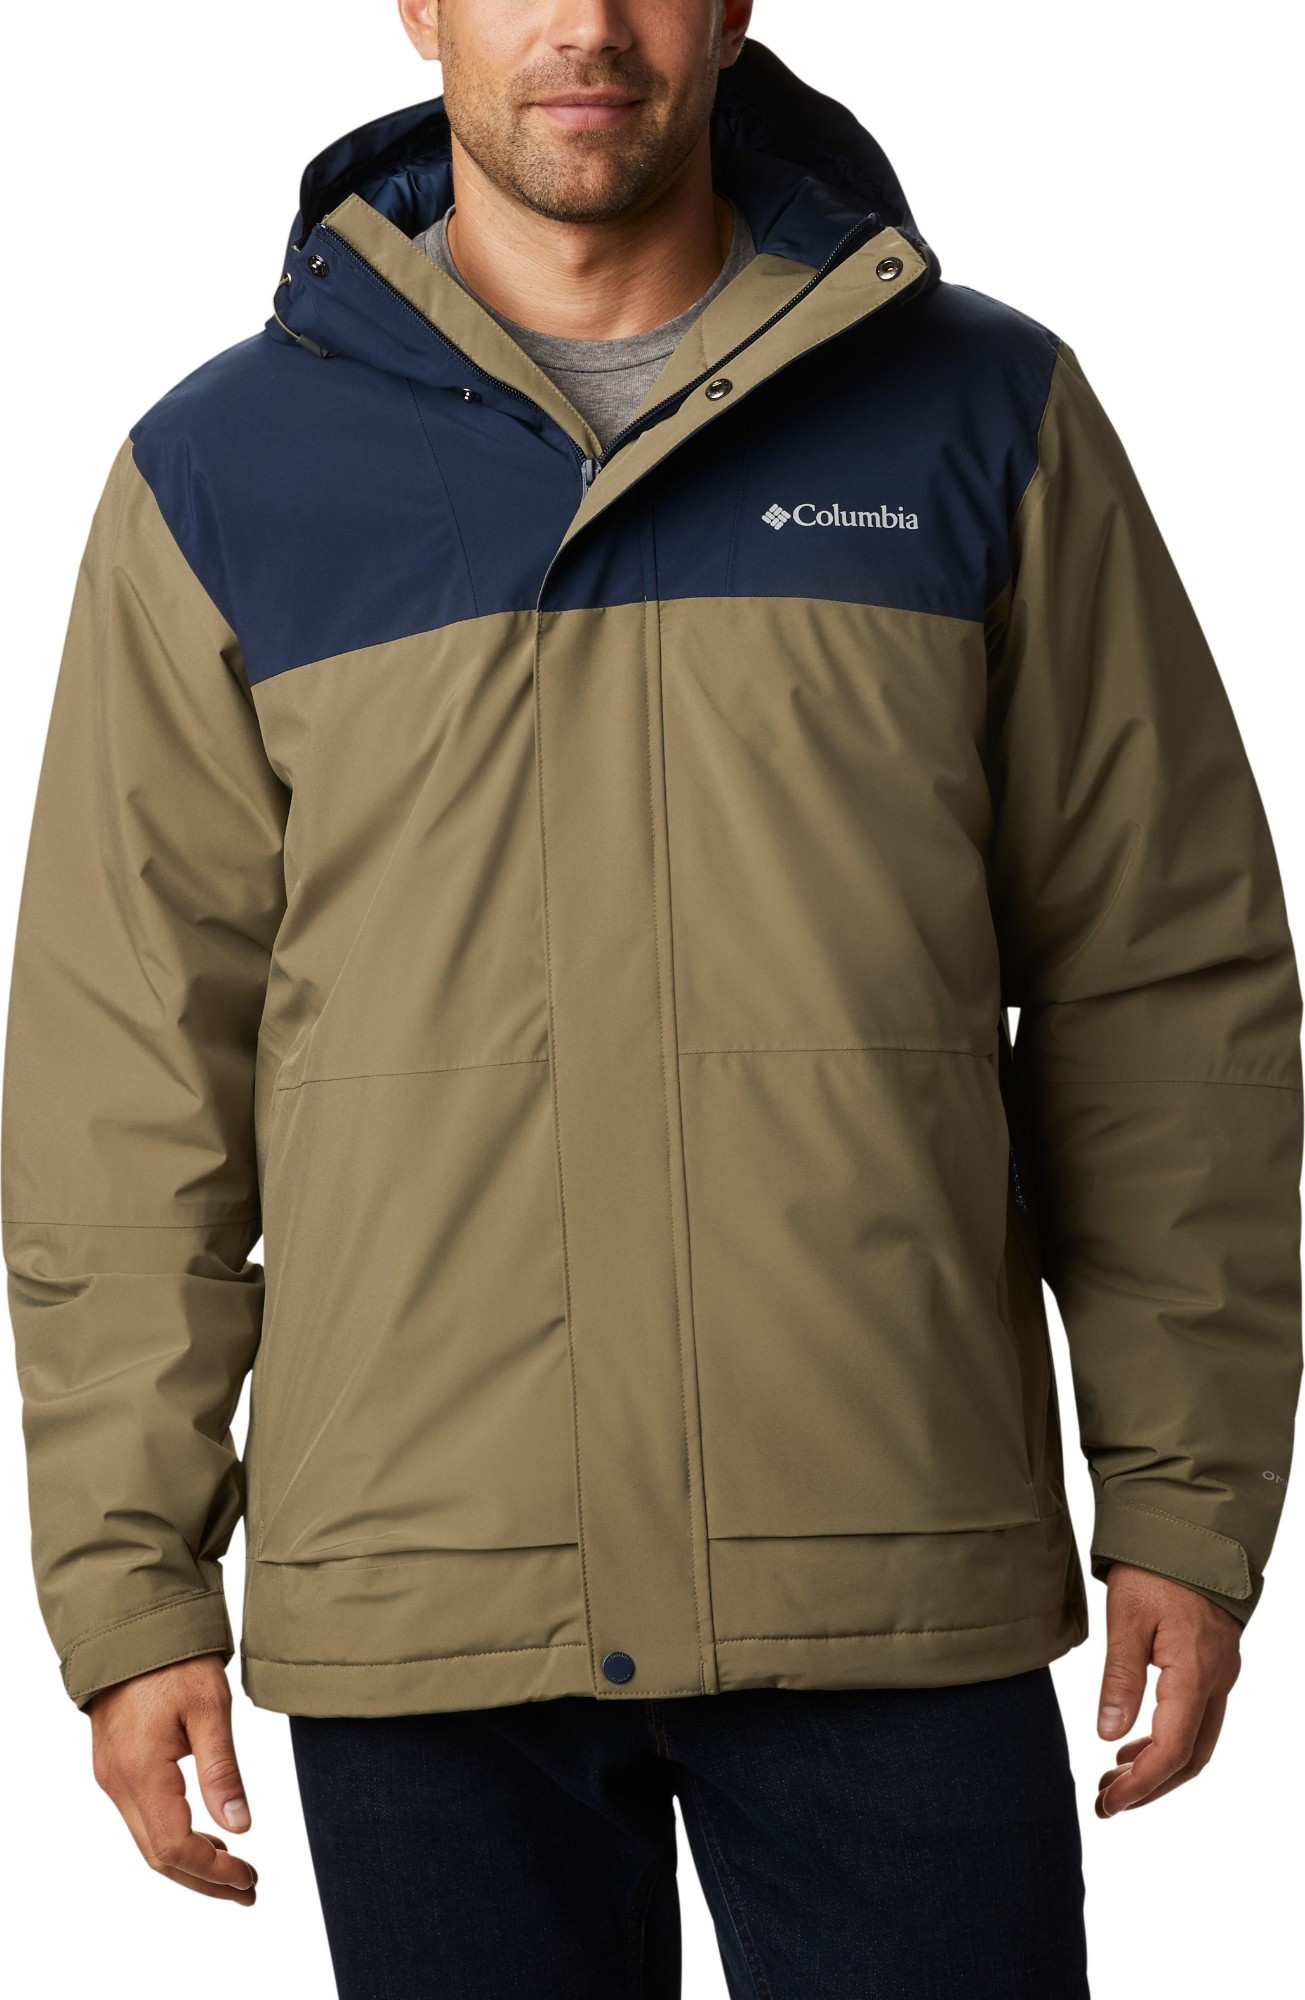 Columbia Horizon Explorer Insulated Jacket Men's Stone Green/Collegiate Navy XL